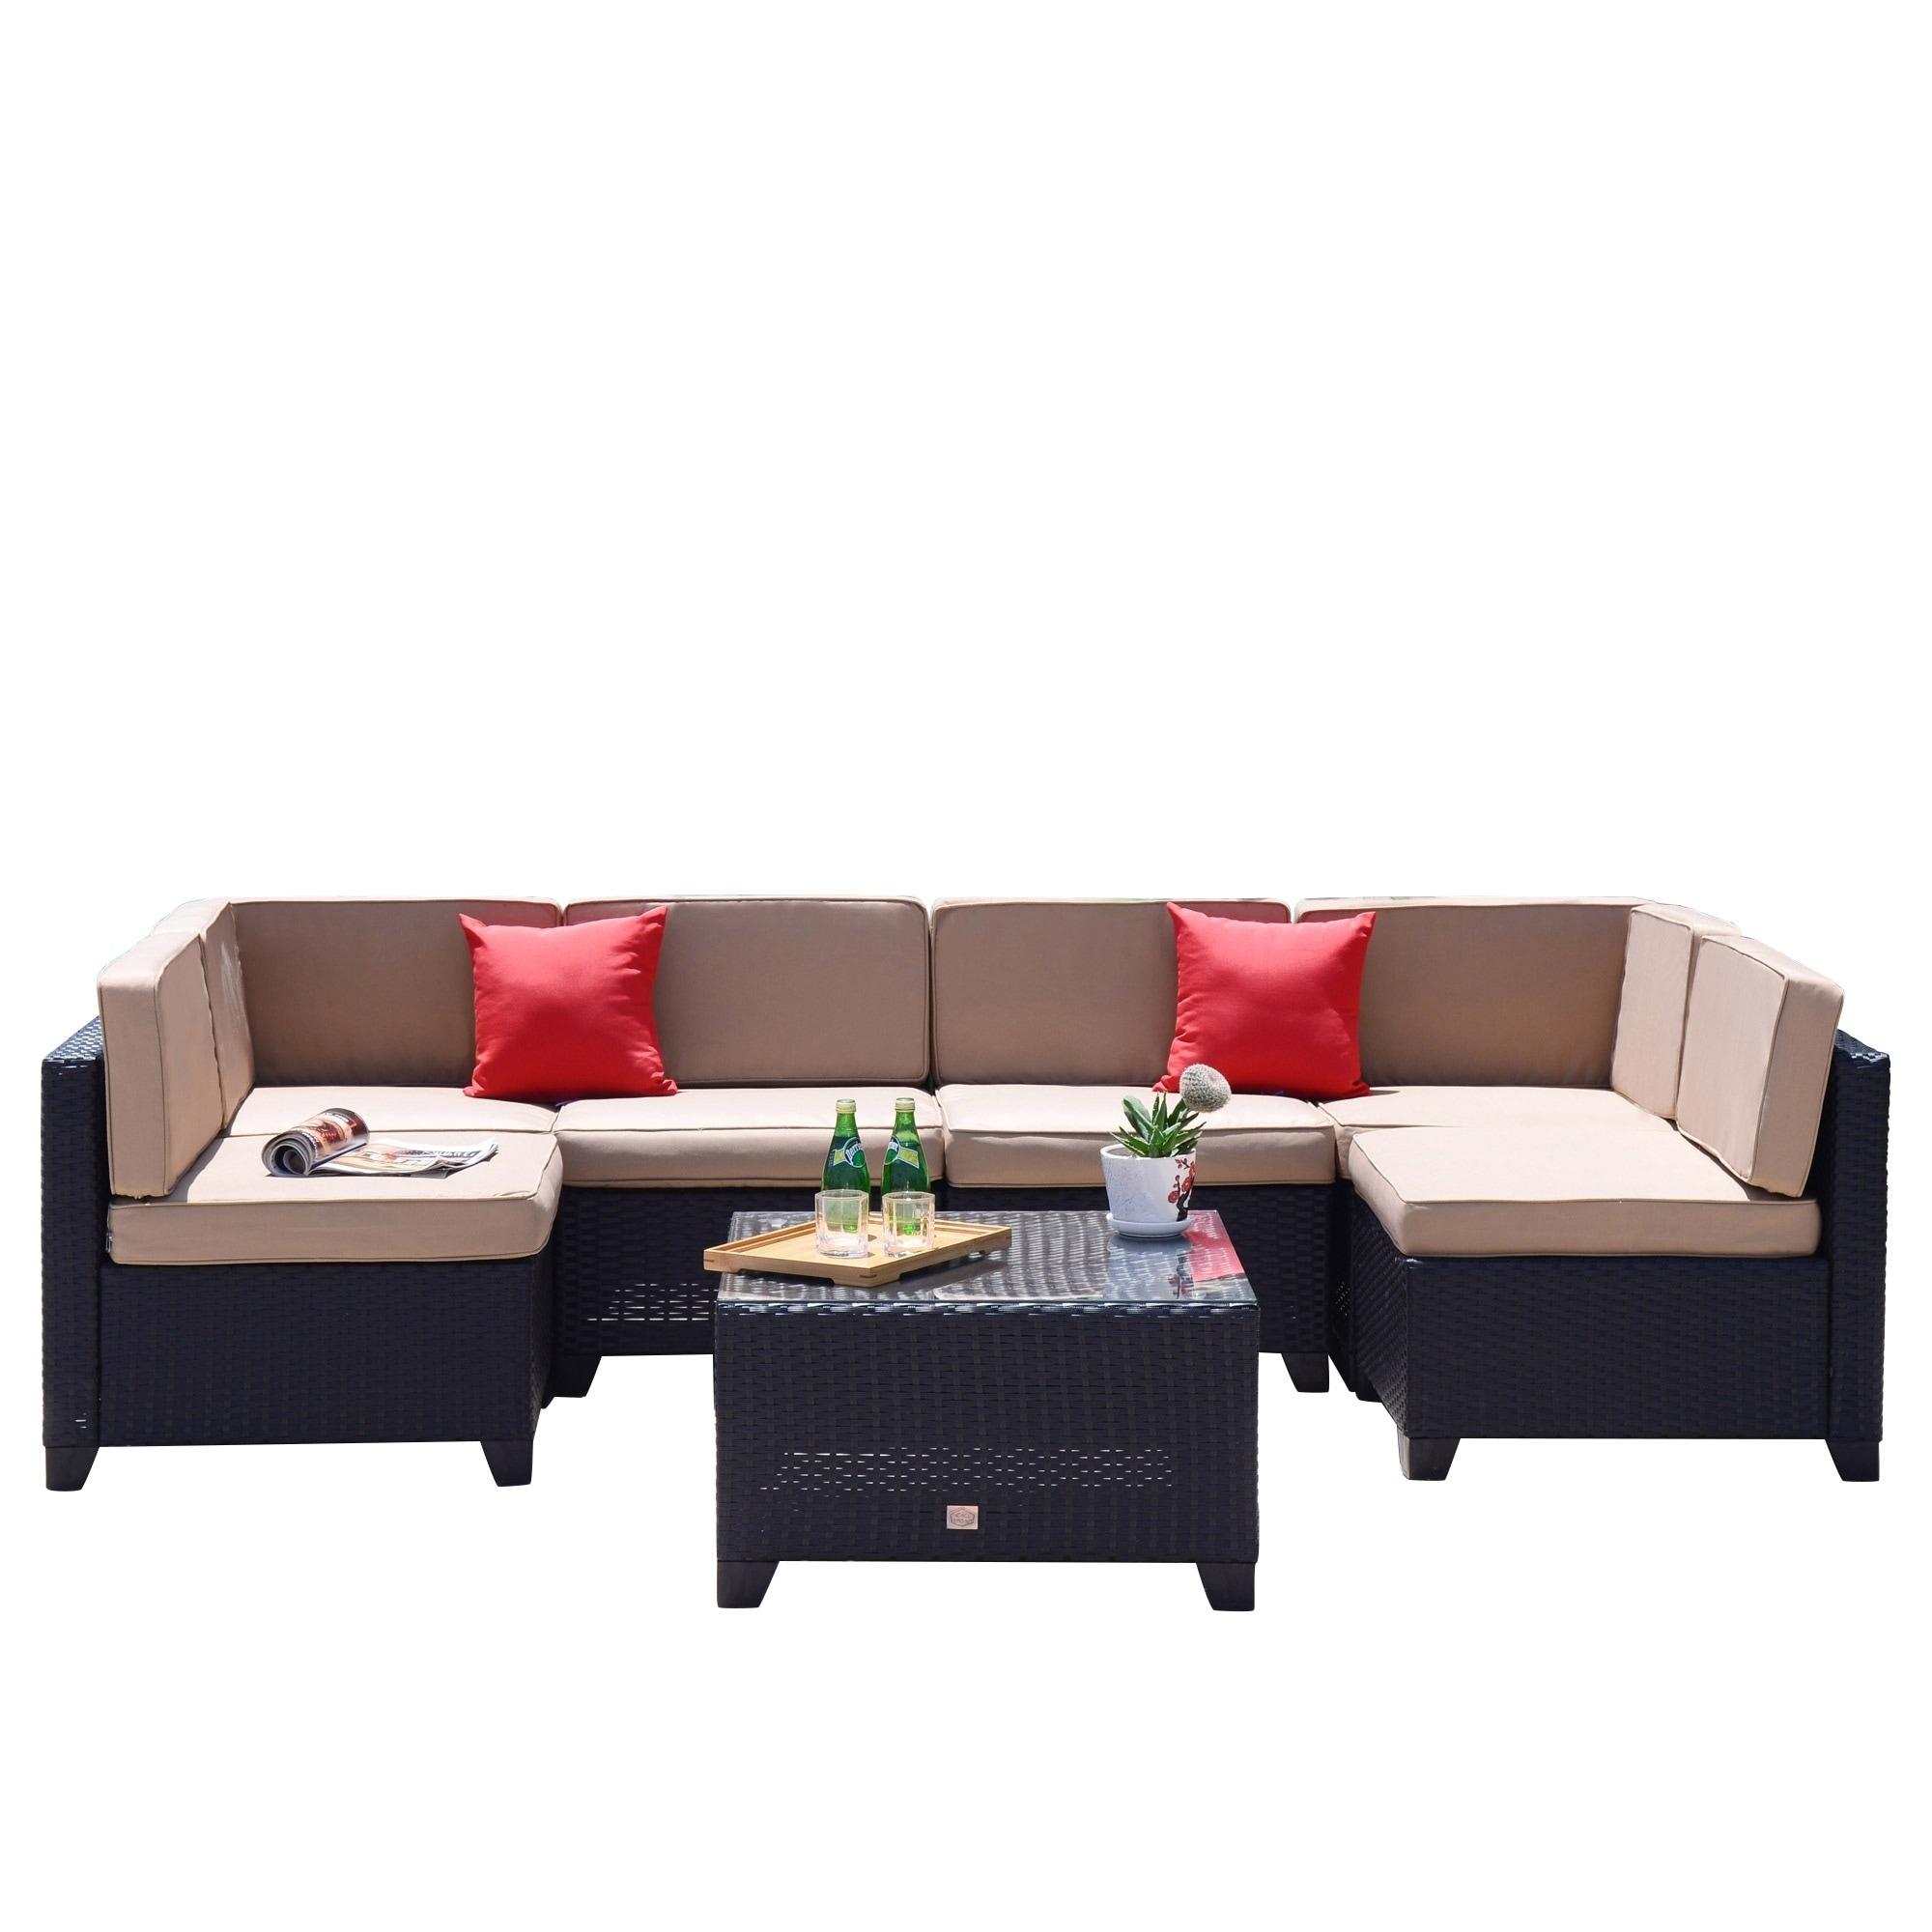 7 PC Patio PE Rattan Wicker Furniture Set Backyard Sectional ...